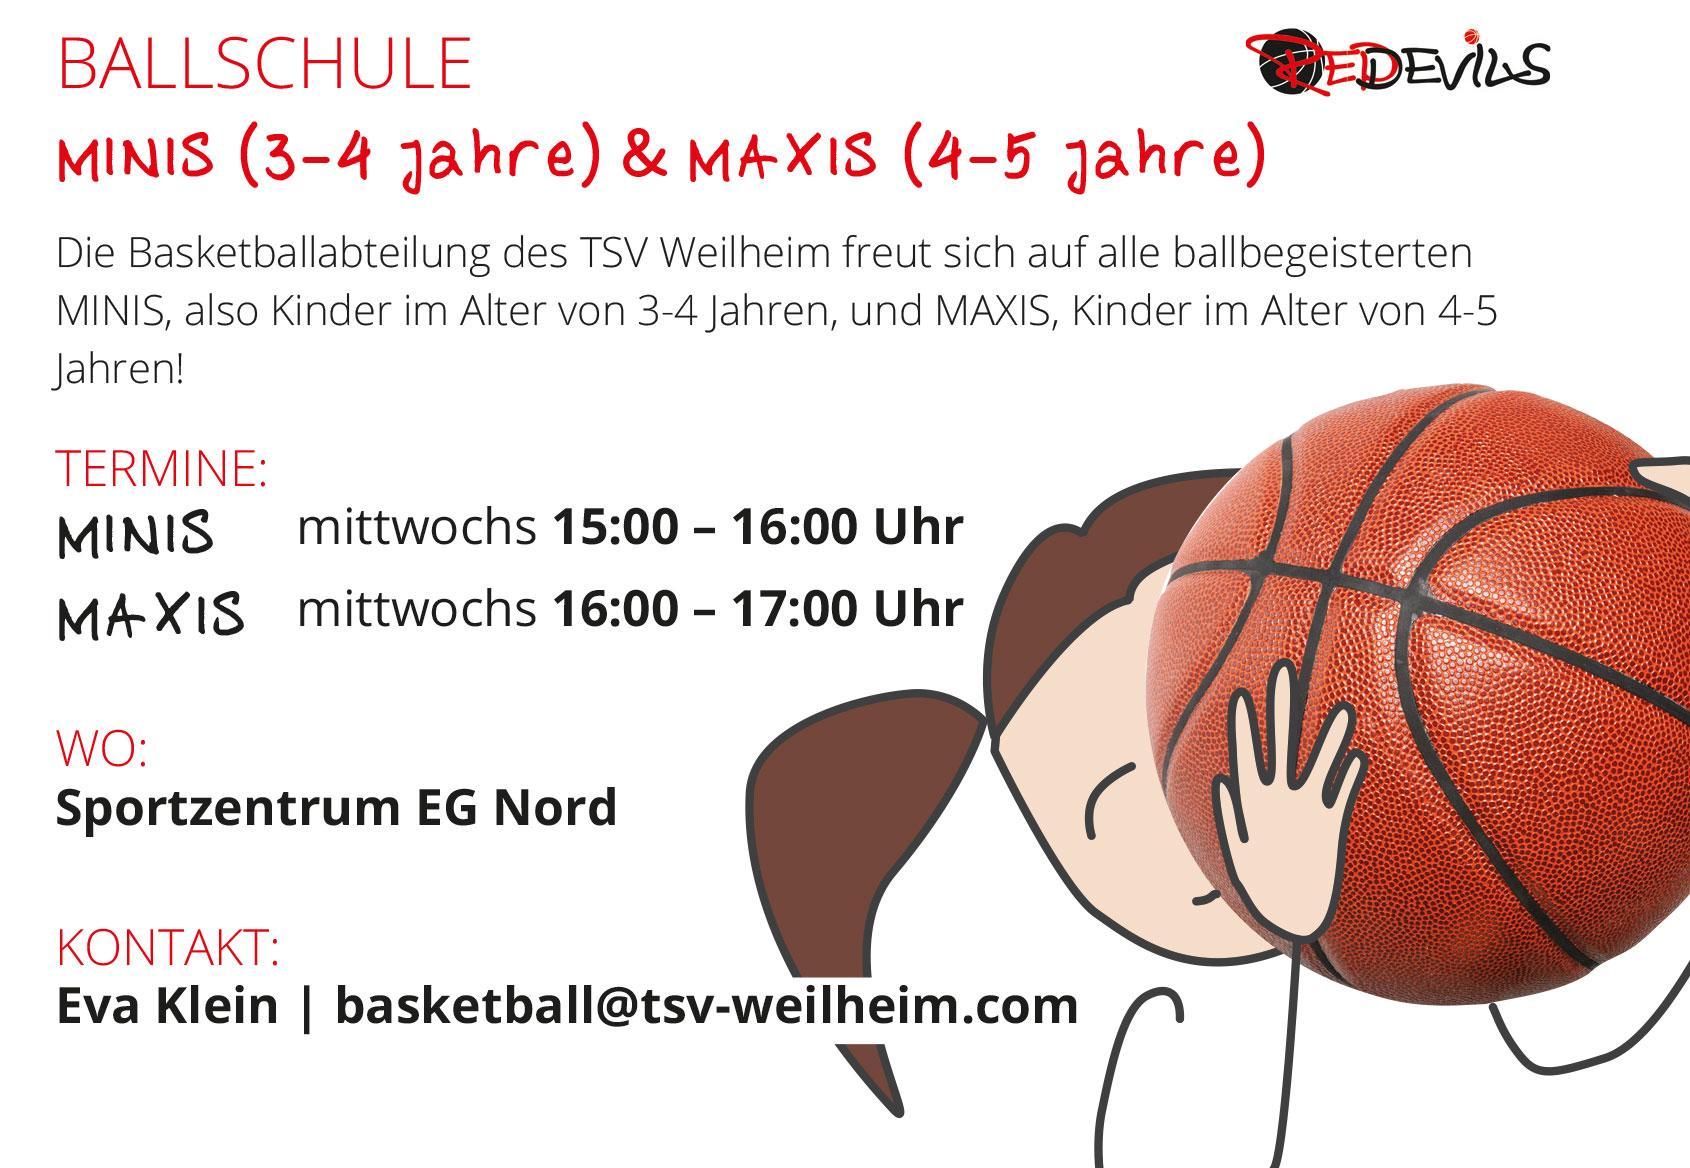 Ballschule_Flyer_A6_print-1